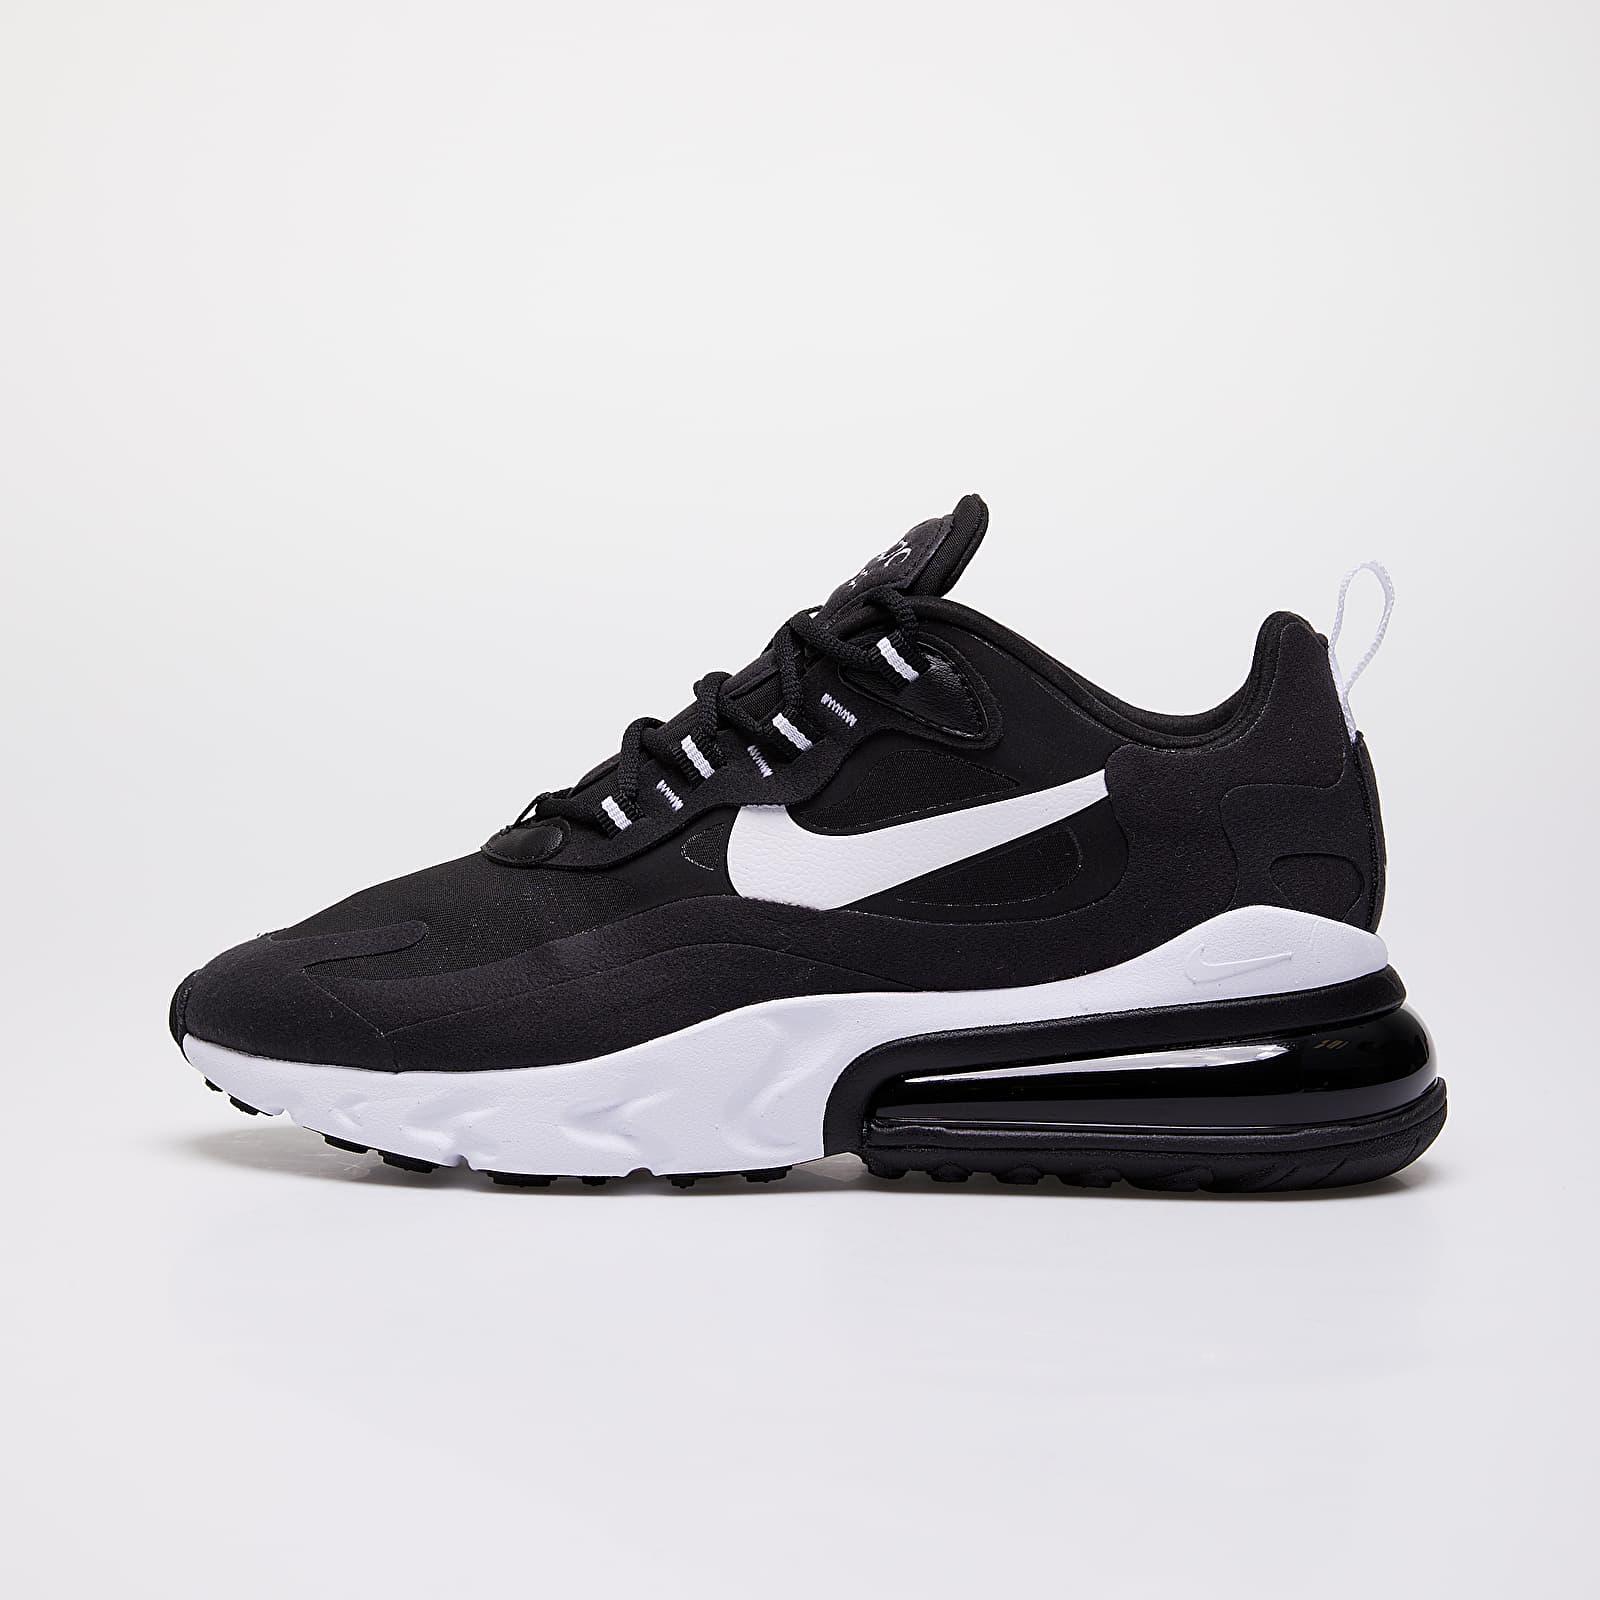 Dámske topánky a tenisky Nike W Air Max 270 React Black/ White-Black-Black